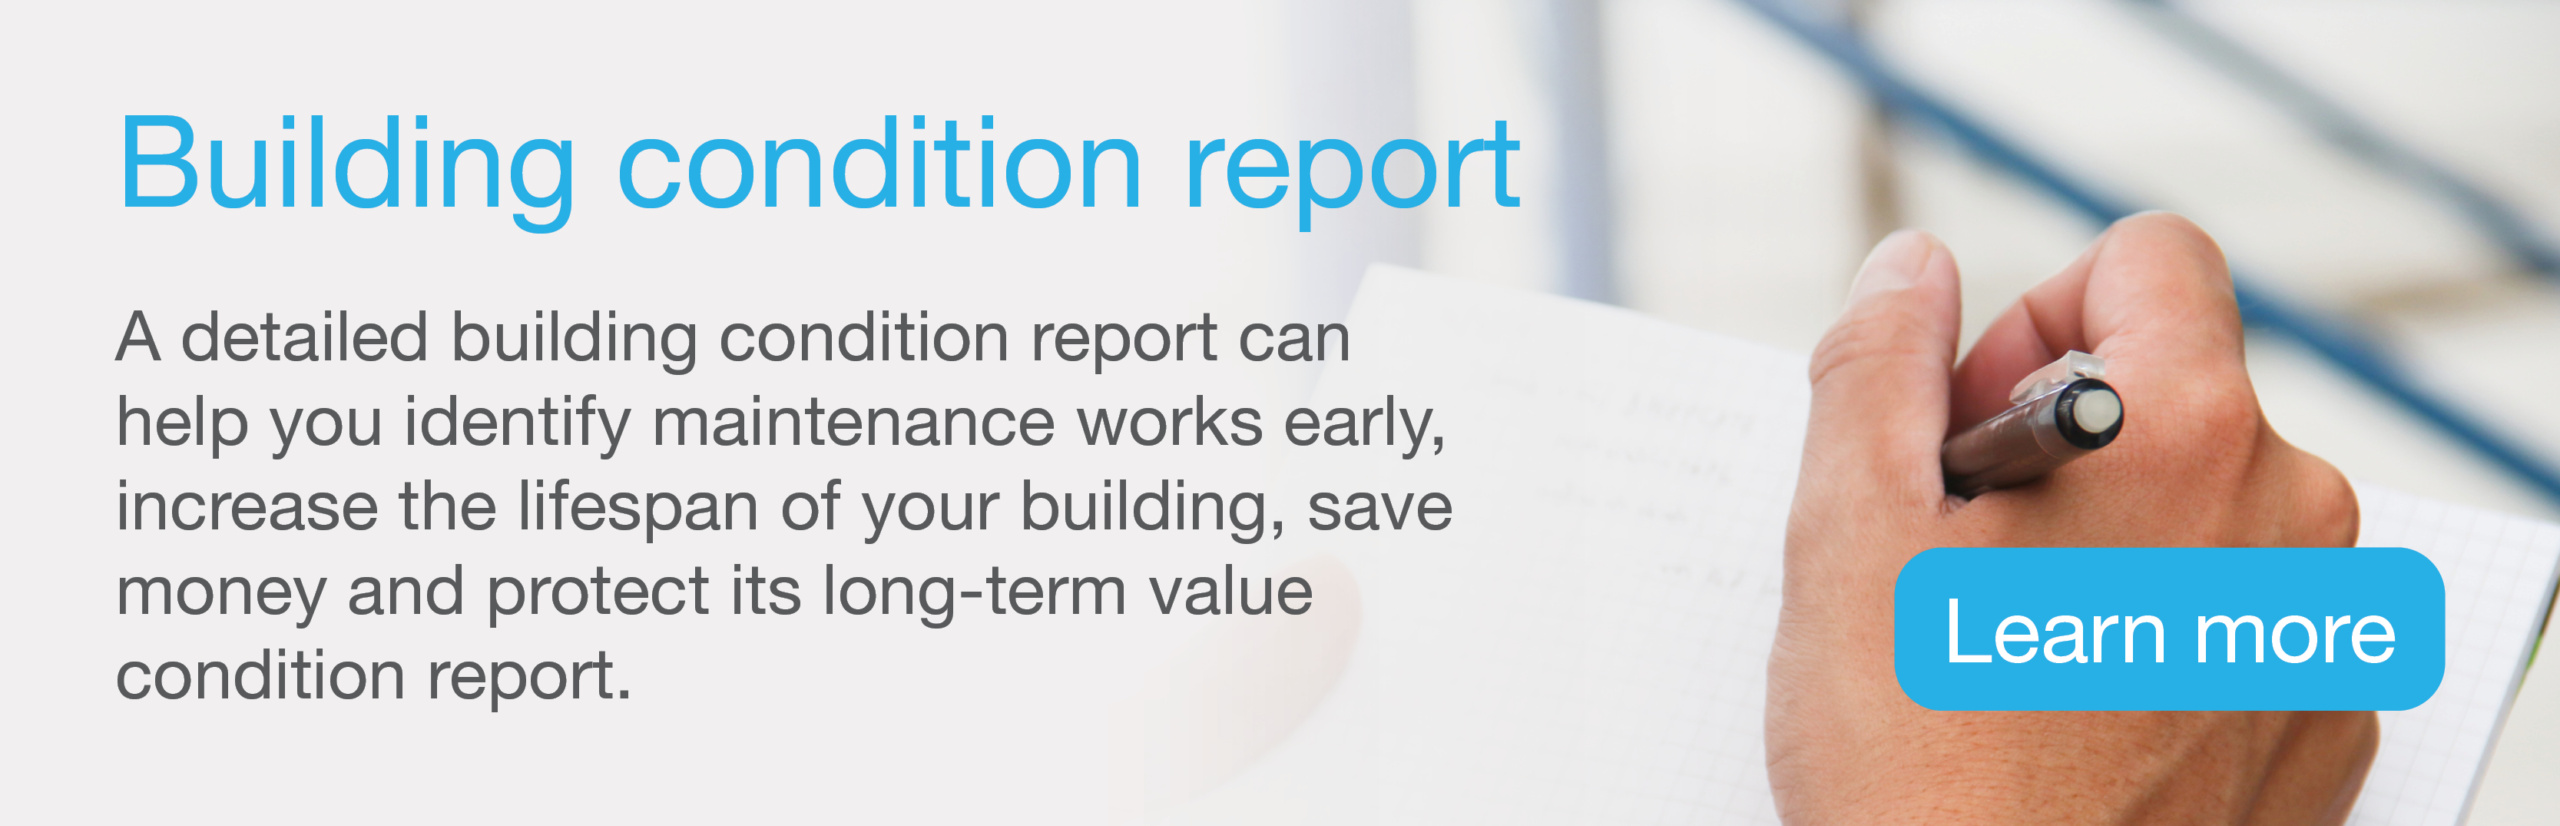 Building condition report